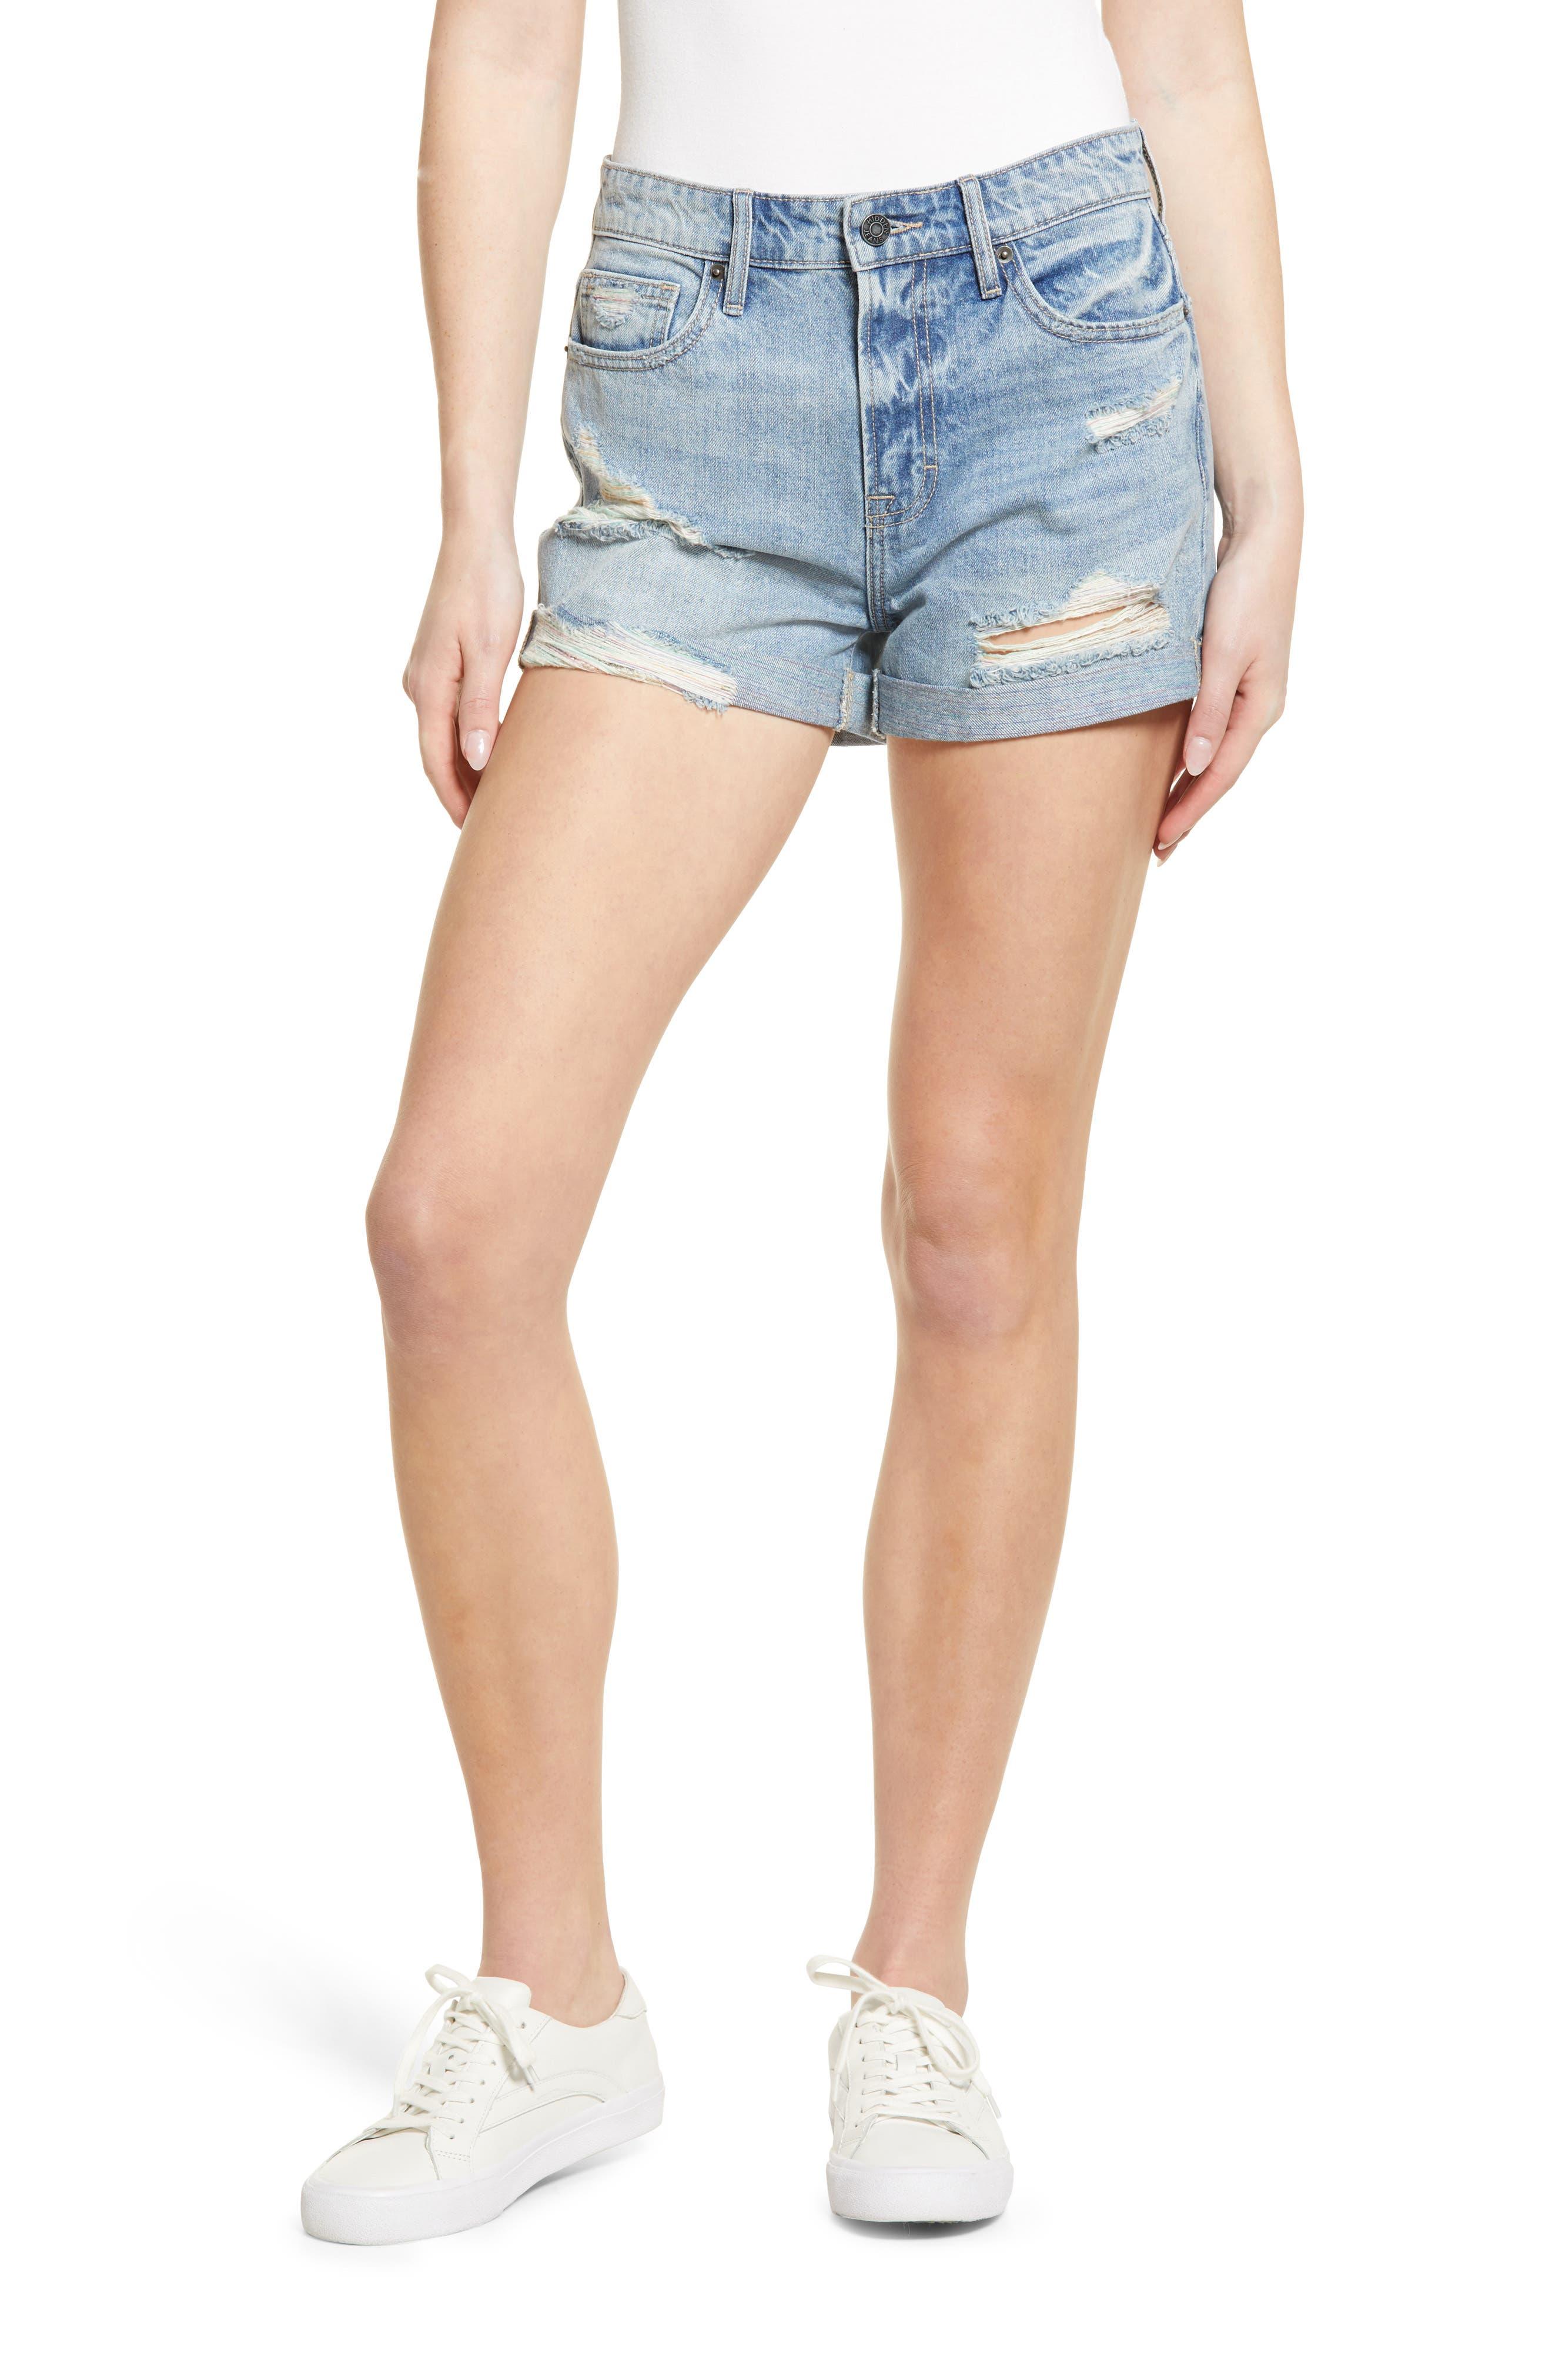 Distressed High Waist Nonstretch Cutoff Denim Shorts